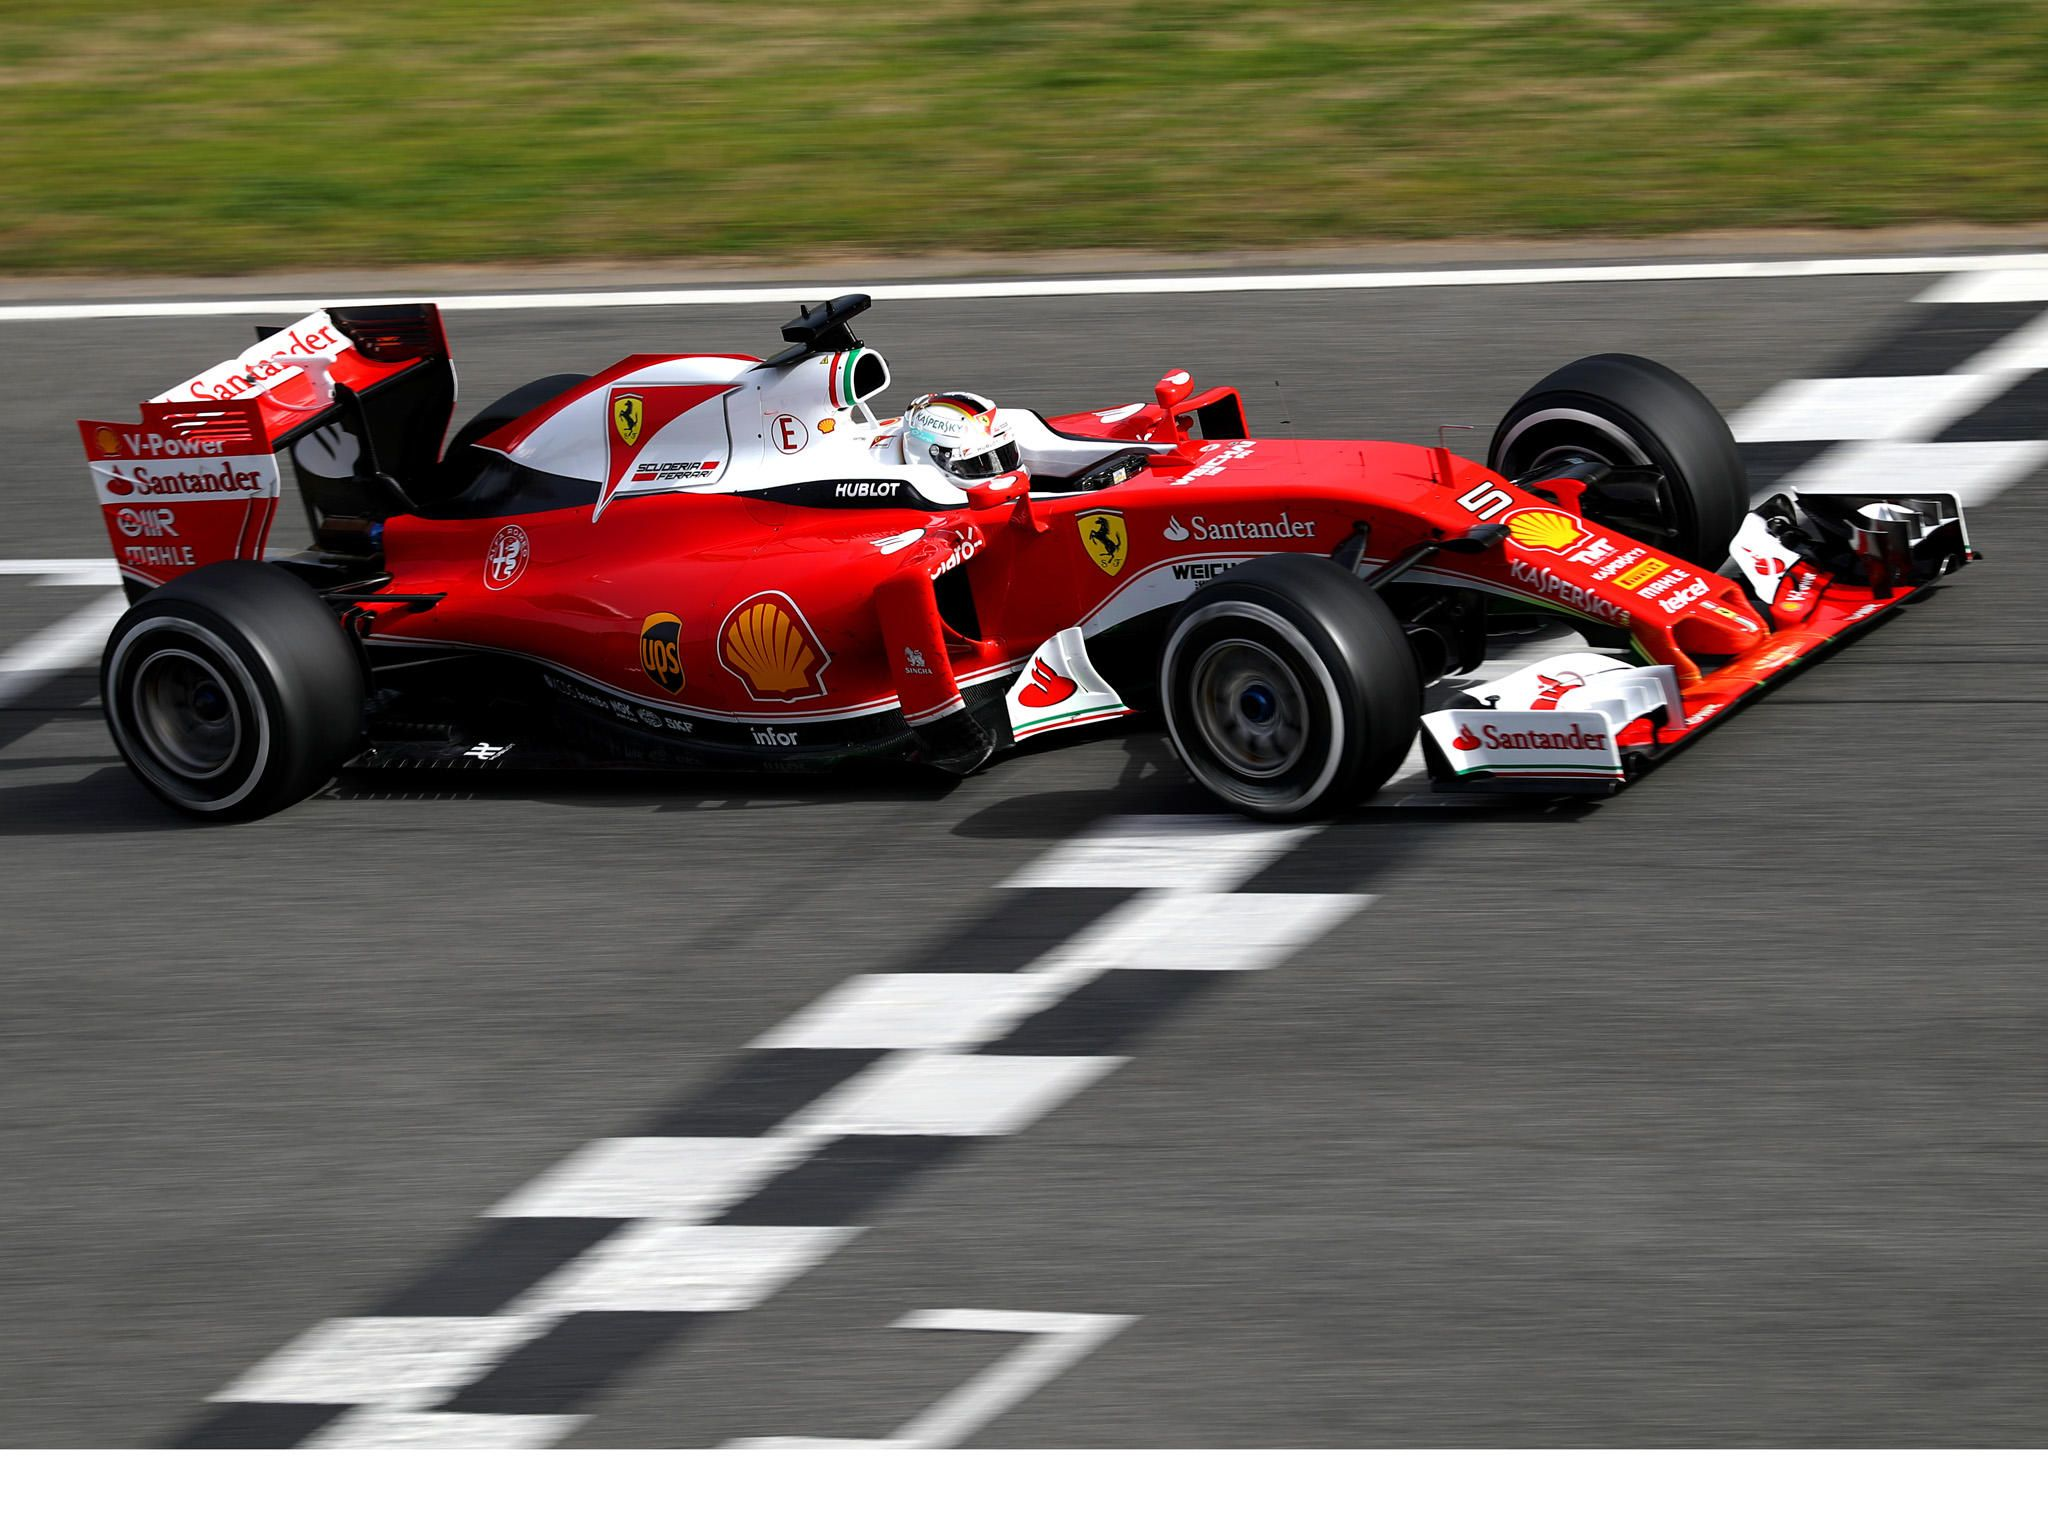 2016 Ferrari Sf16 H Testing 2048x1536 Ipad Air Ipad 4 Ipad 3 Ipad Mini With Retina Display 2048 X 1536 Want An Ipad Wallpaper Hamilton Esportes Suica